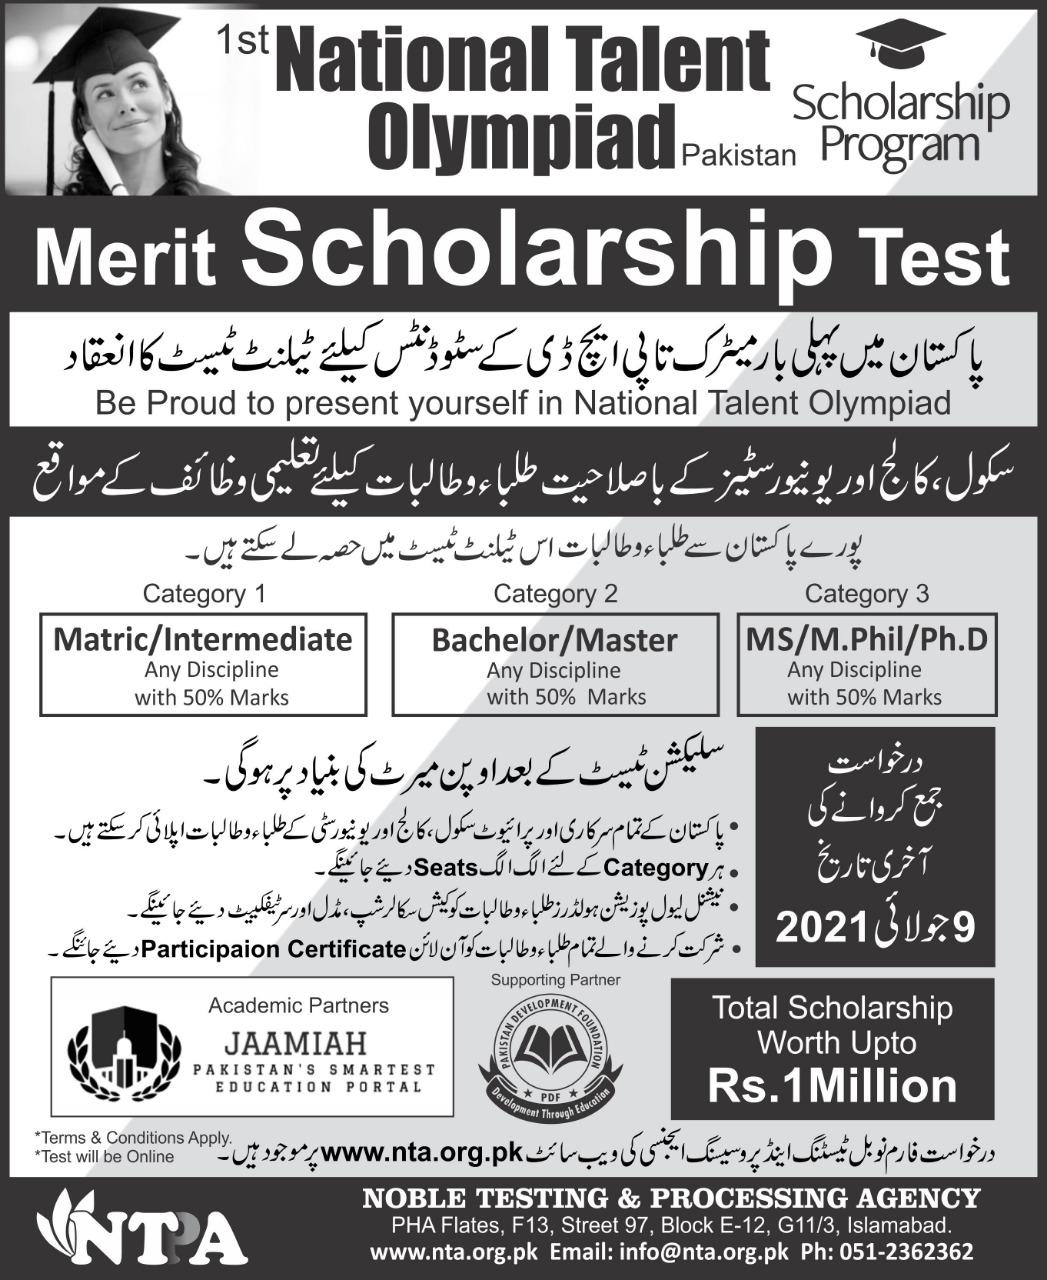 National Talent Olympiad Pakistan Merit Scholarship NTPA Roll No Slip